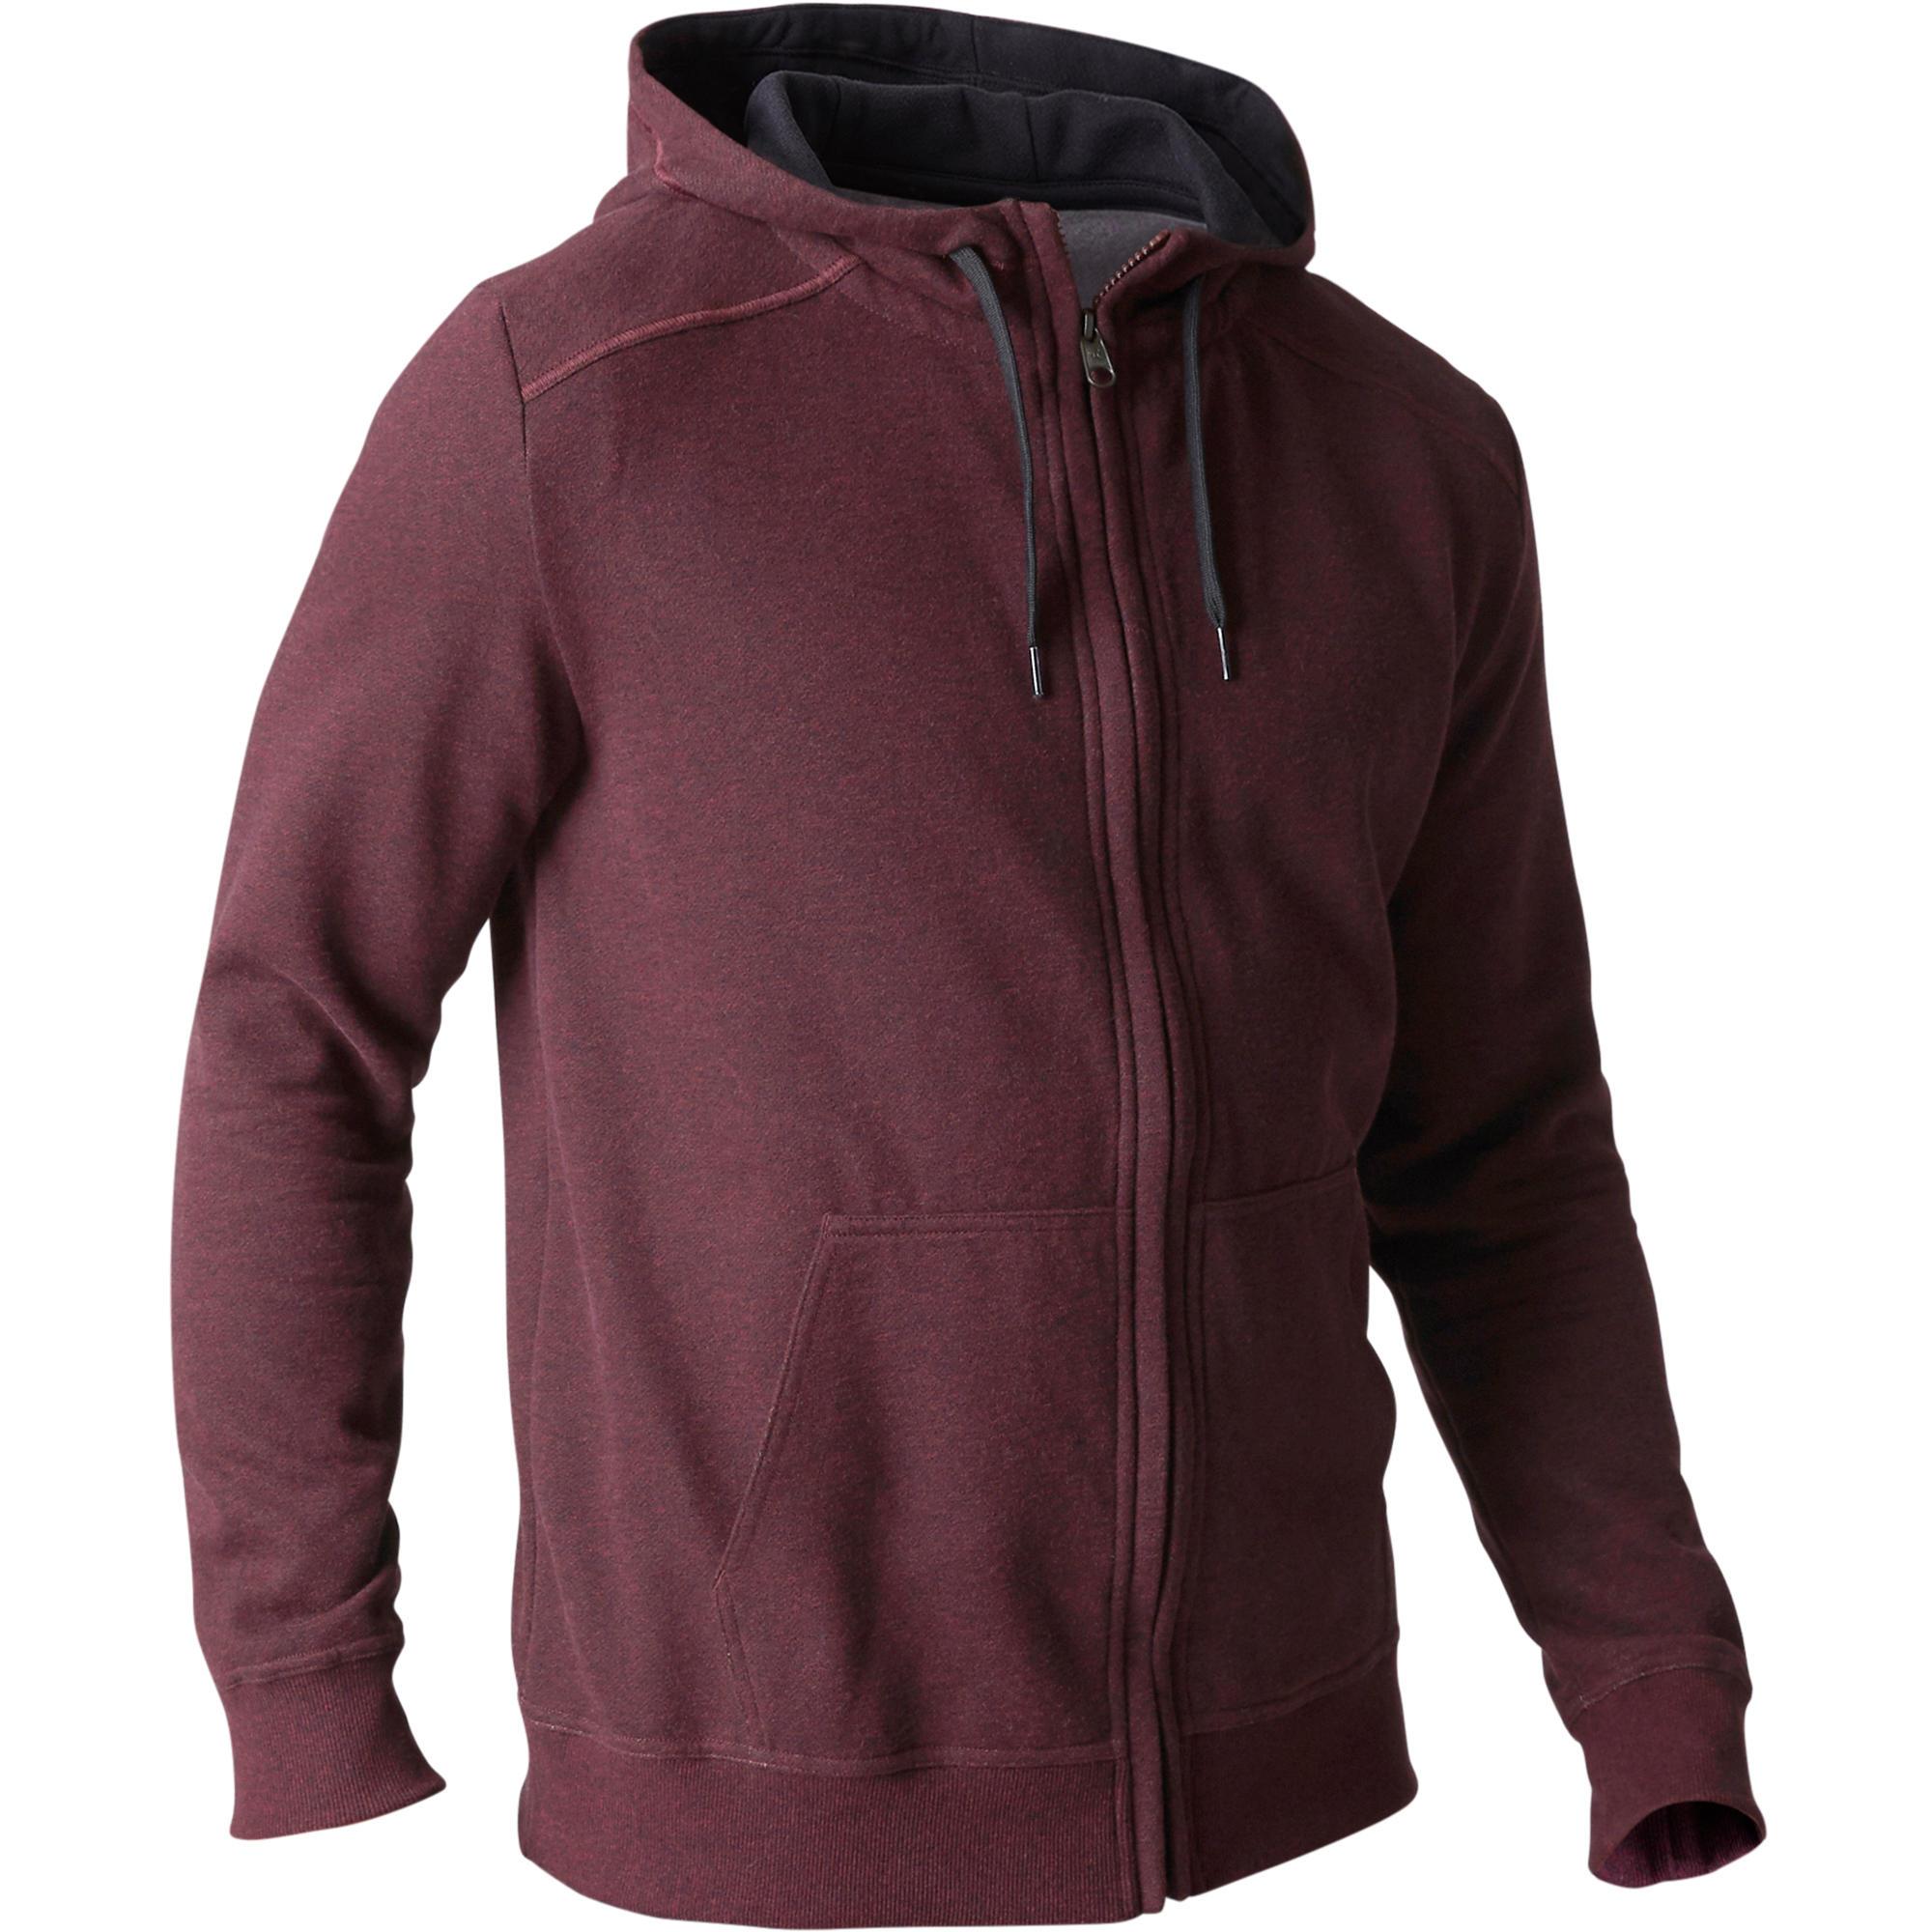 domyos hoodie met rits 900 voor gym en pilates heren decathlon. Black Bedroom Furniture Sets. Home Design Ideas